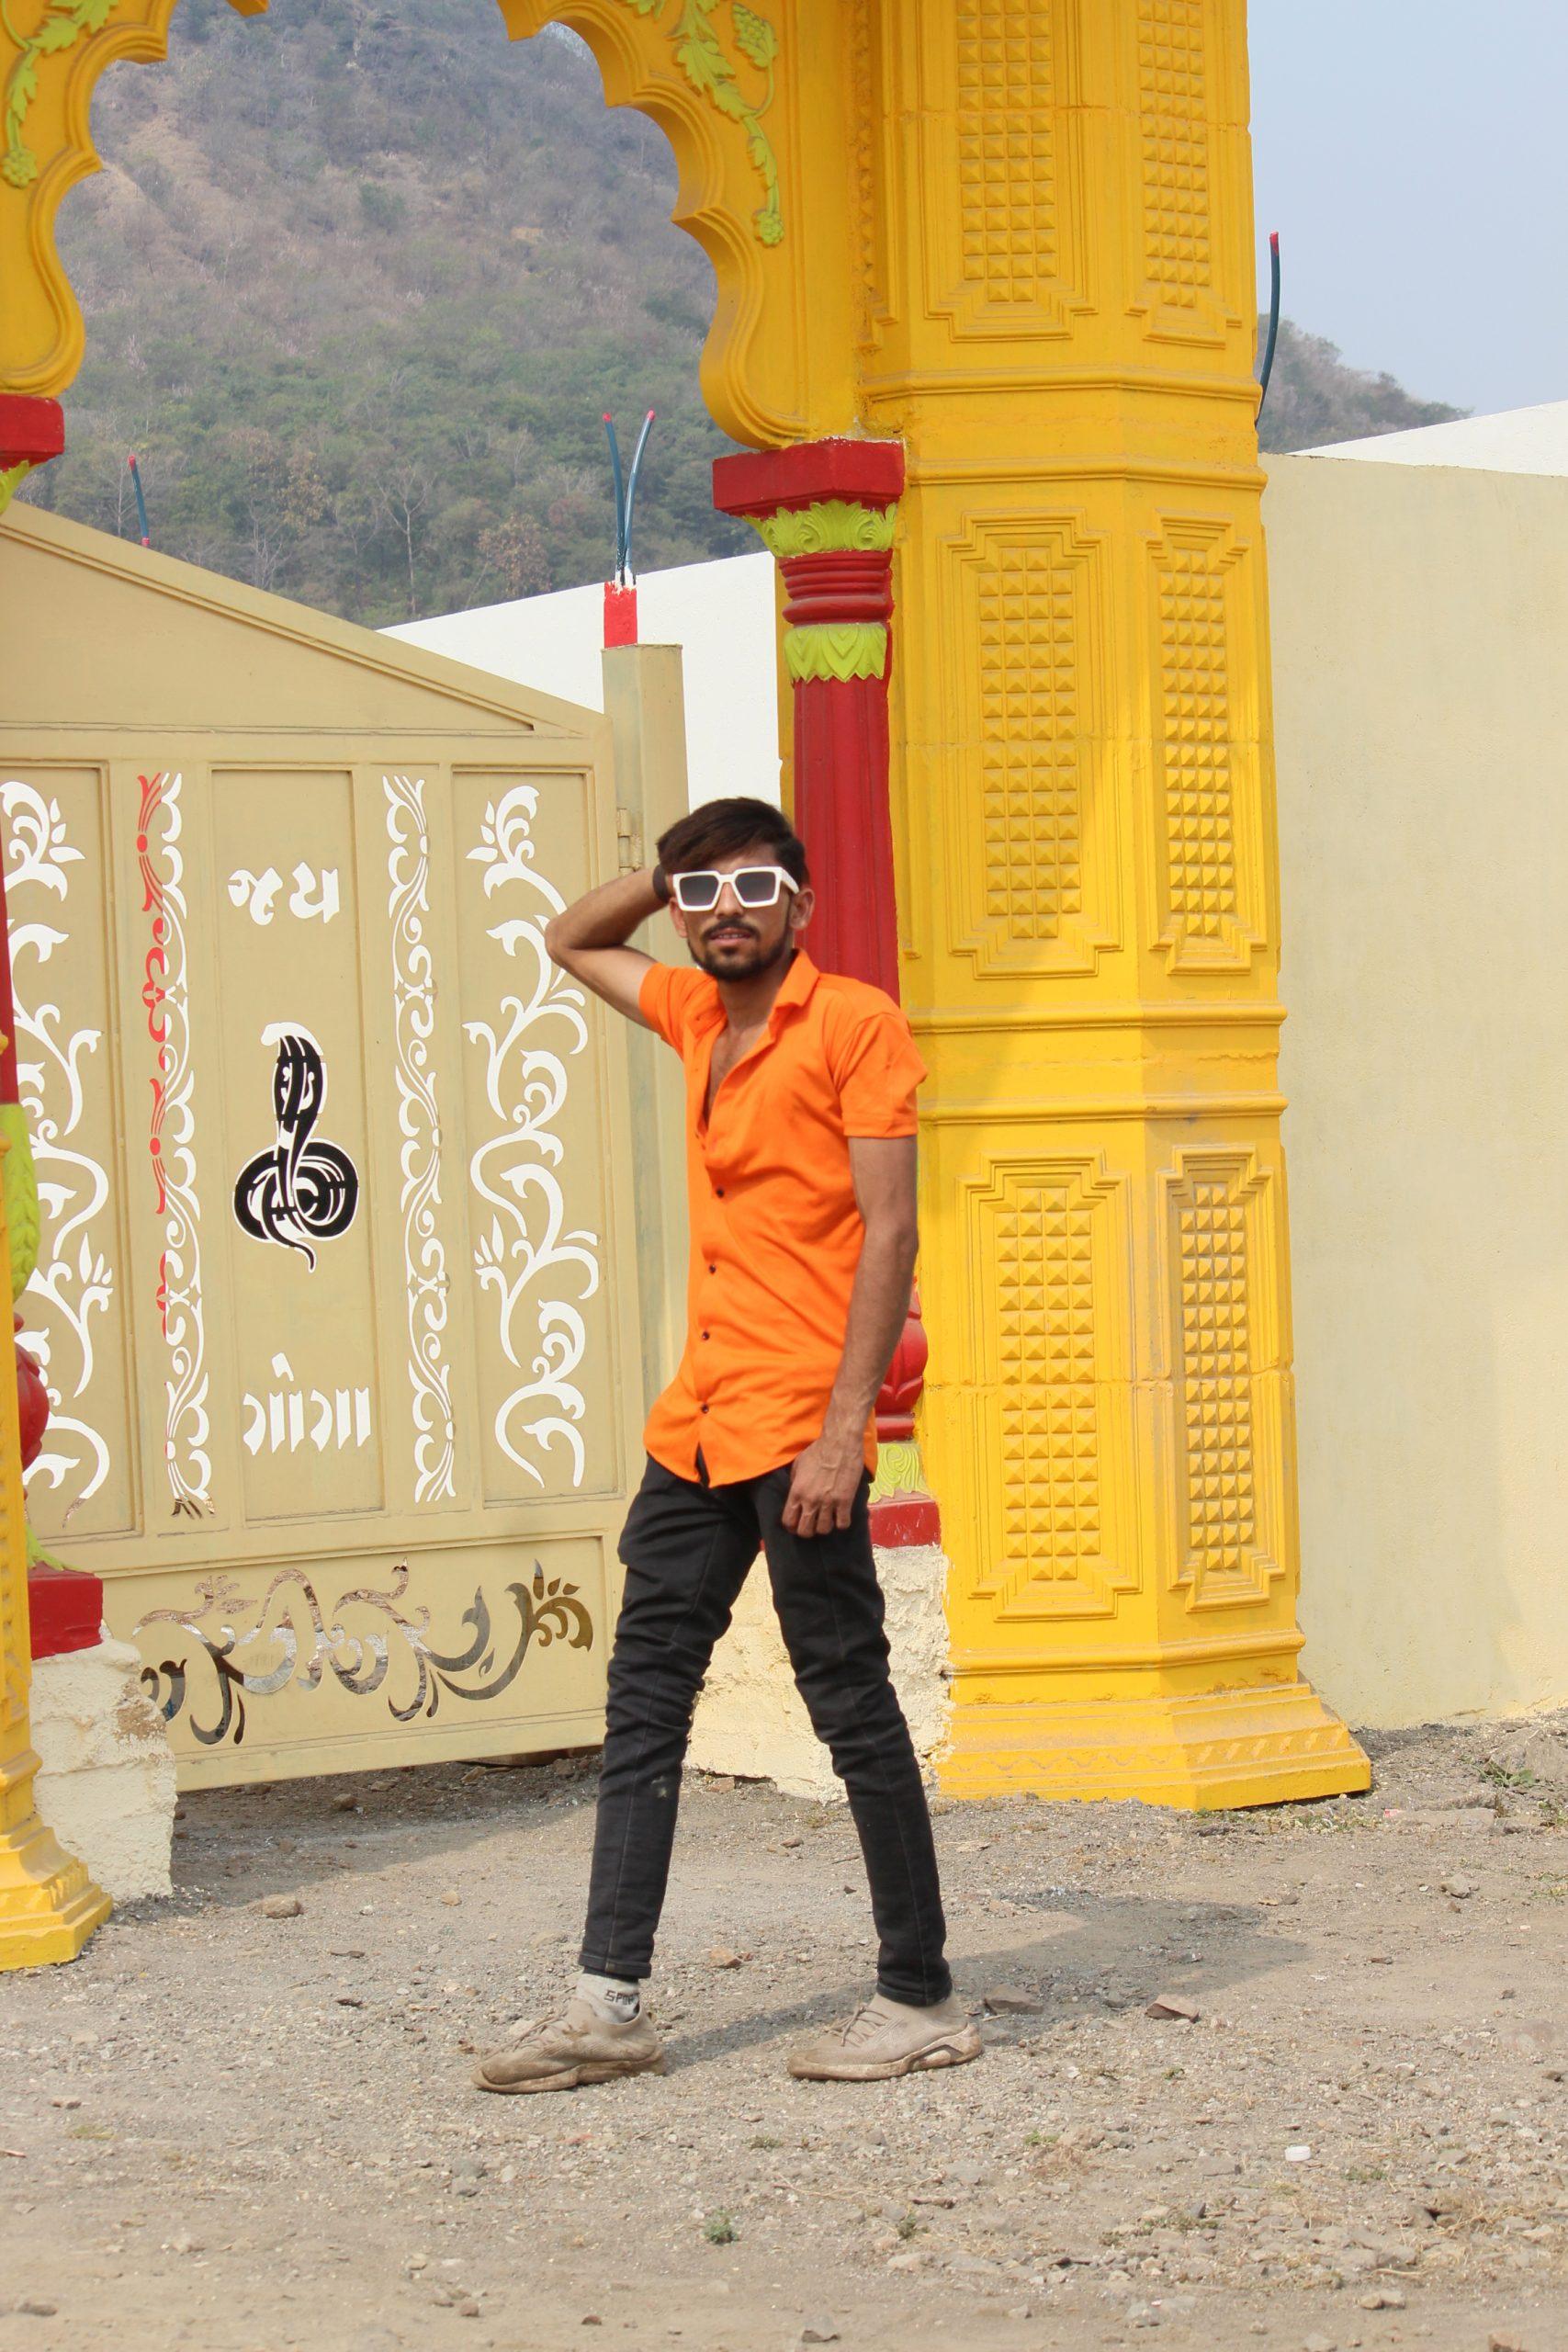 A boy near a gate